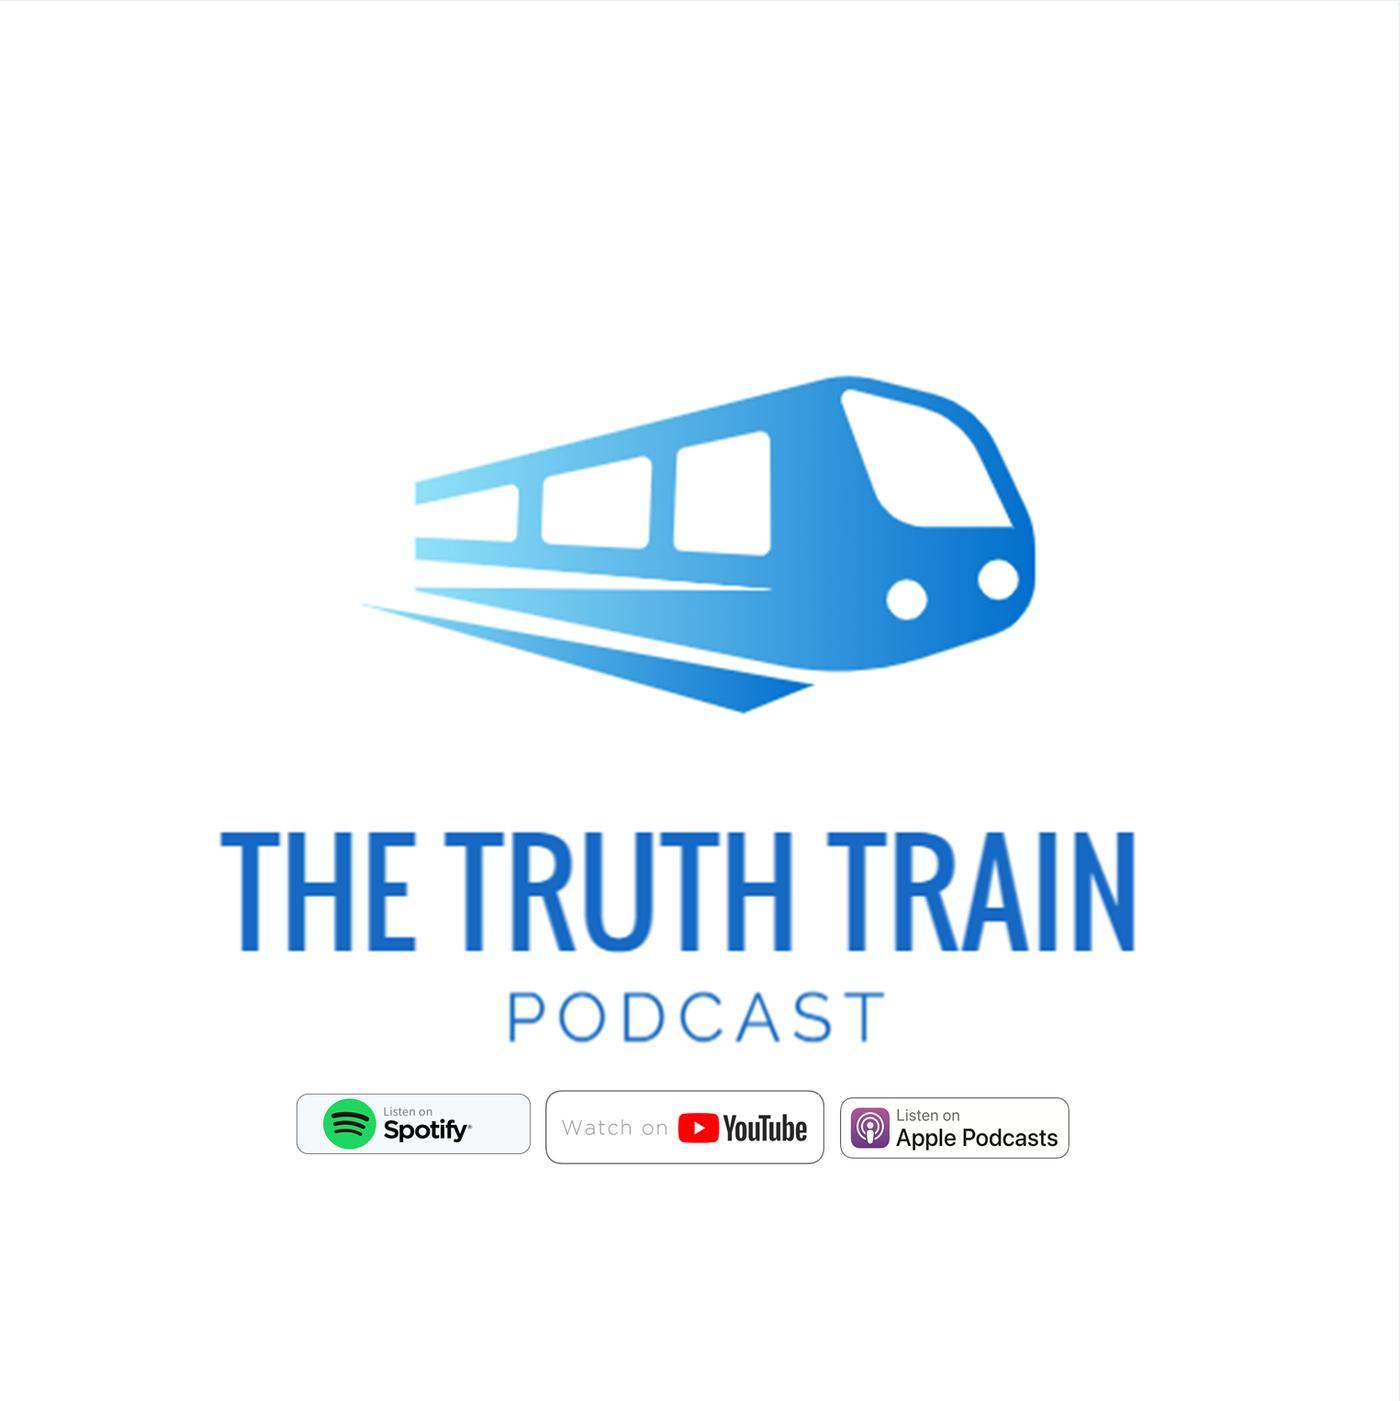 The Truth Train Podcast - thetruthtrainpodcast | Listen Notes